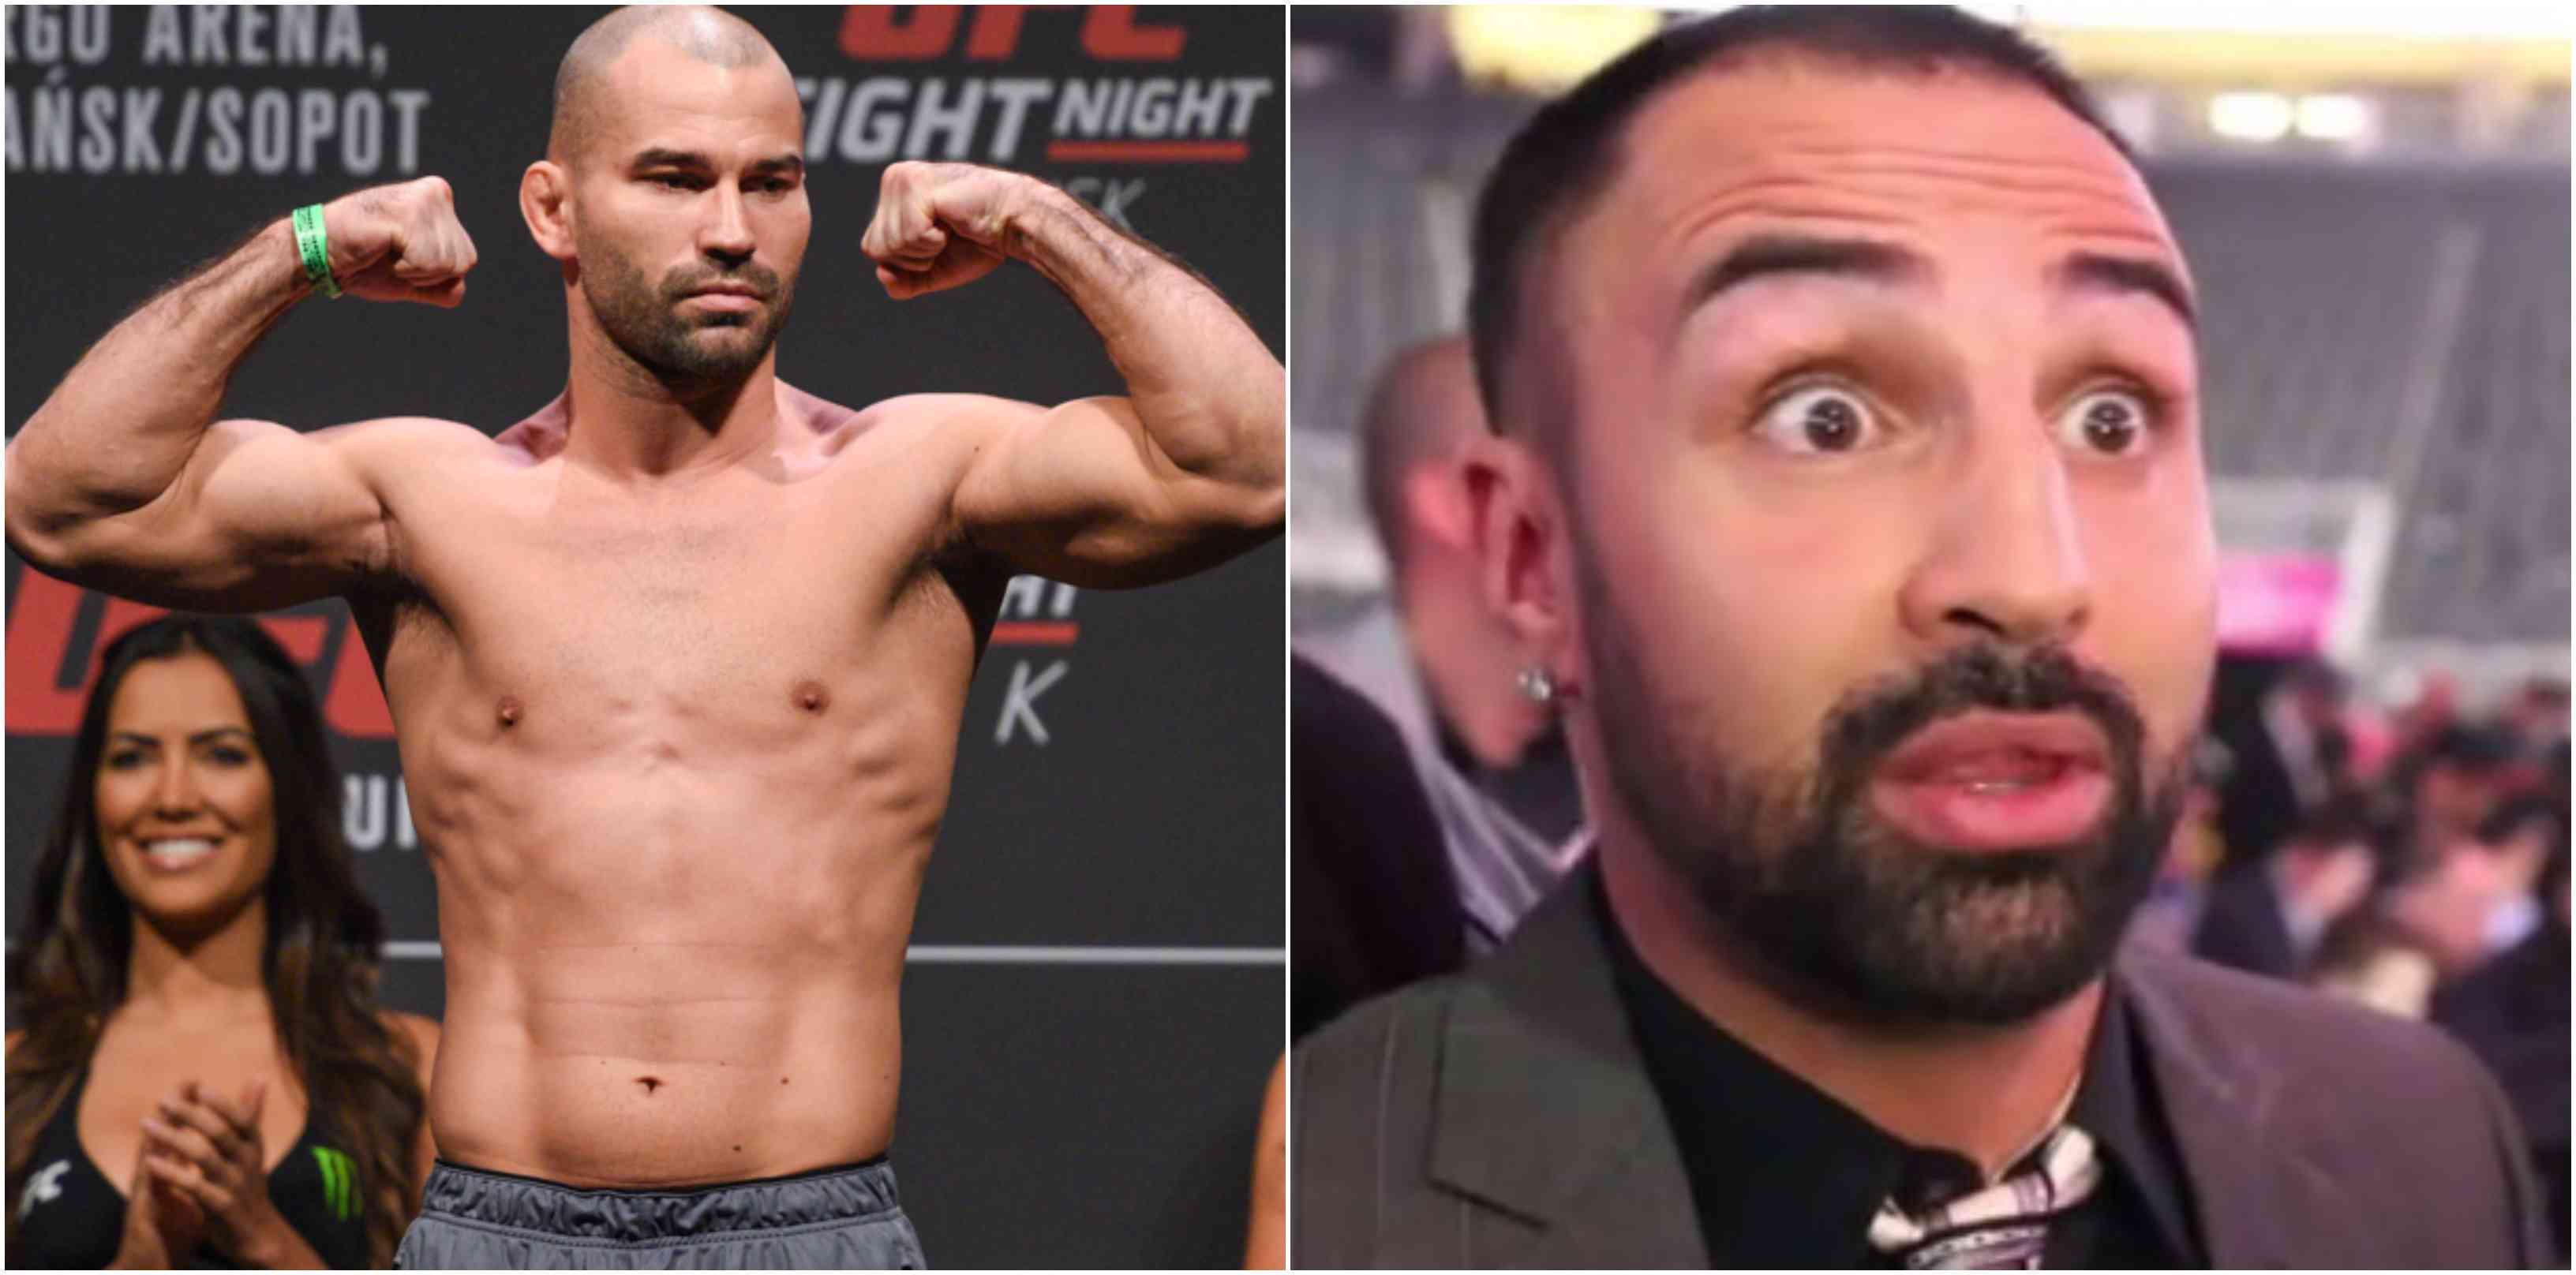 Former Boxing champion Paulie Malignaggi expected to fight Artem Lobov on Bare Knuckle FC - Artem